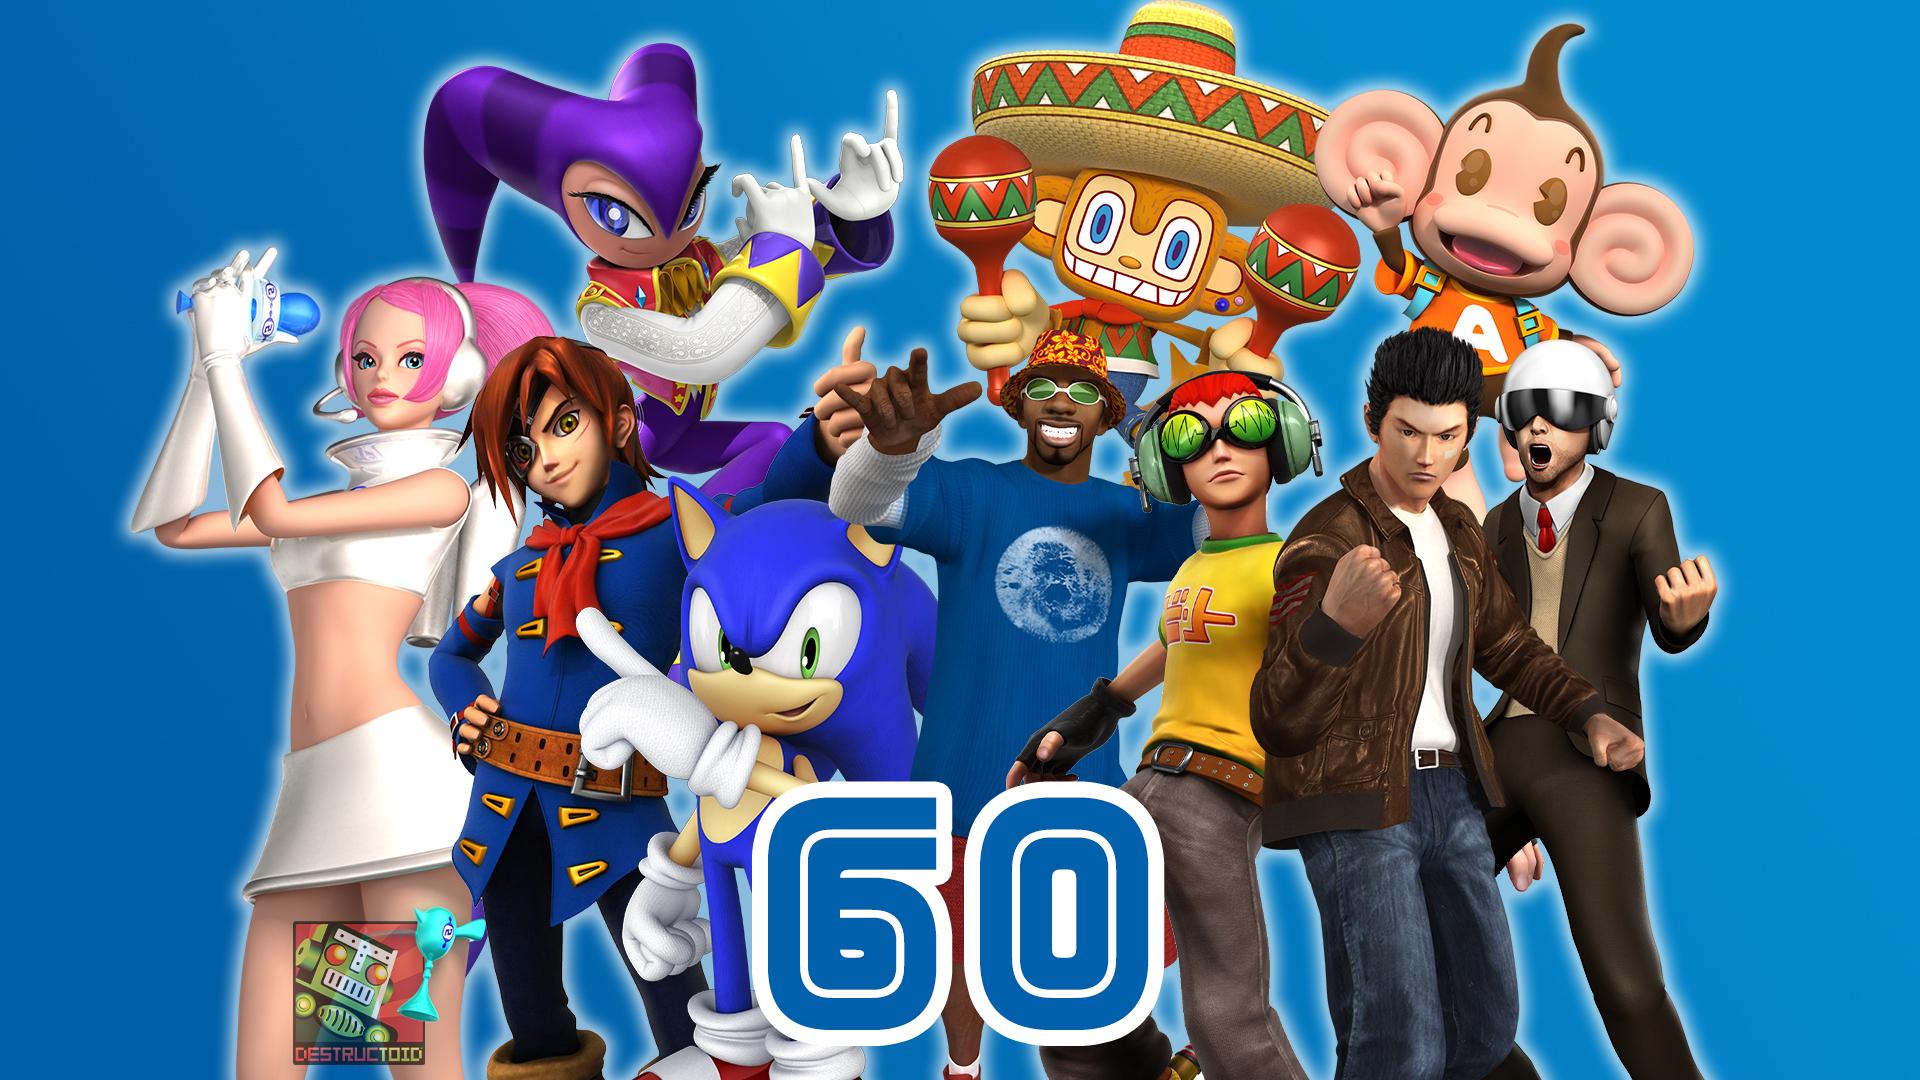 Sega is turning 60 so let's name our favorite Sega games screenshot